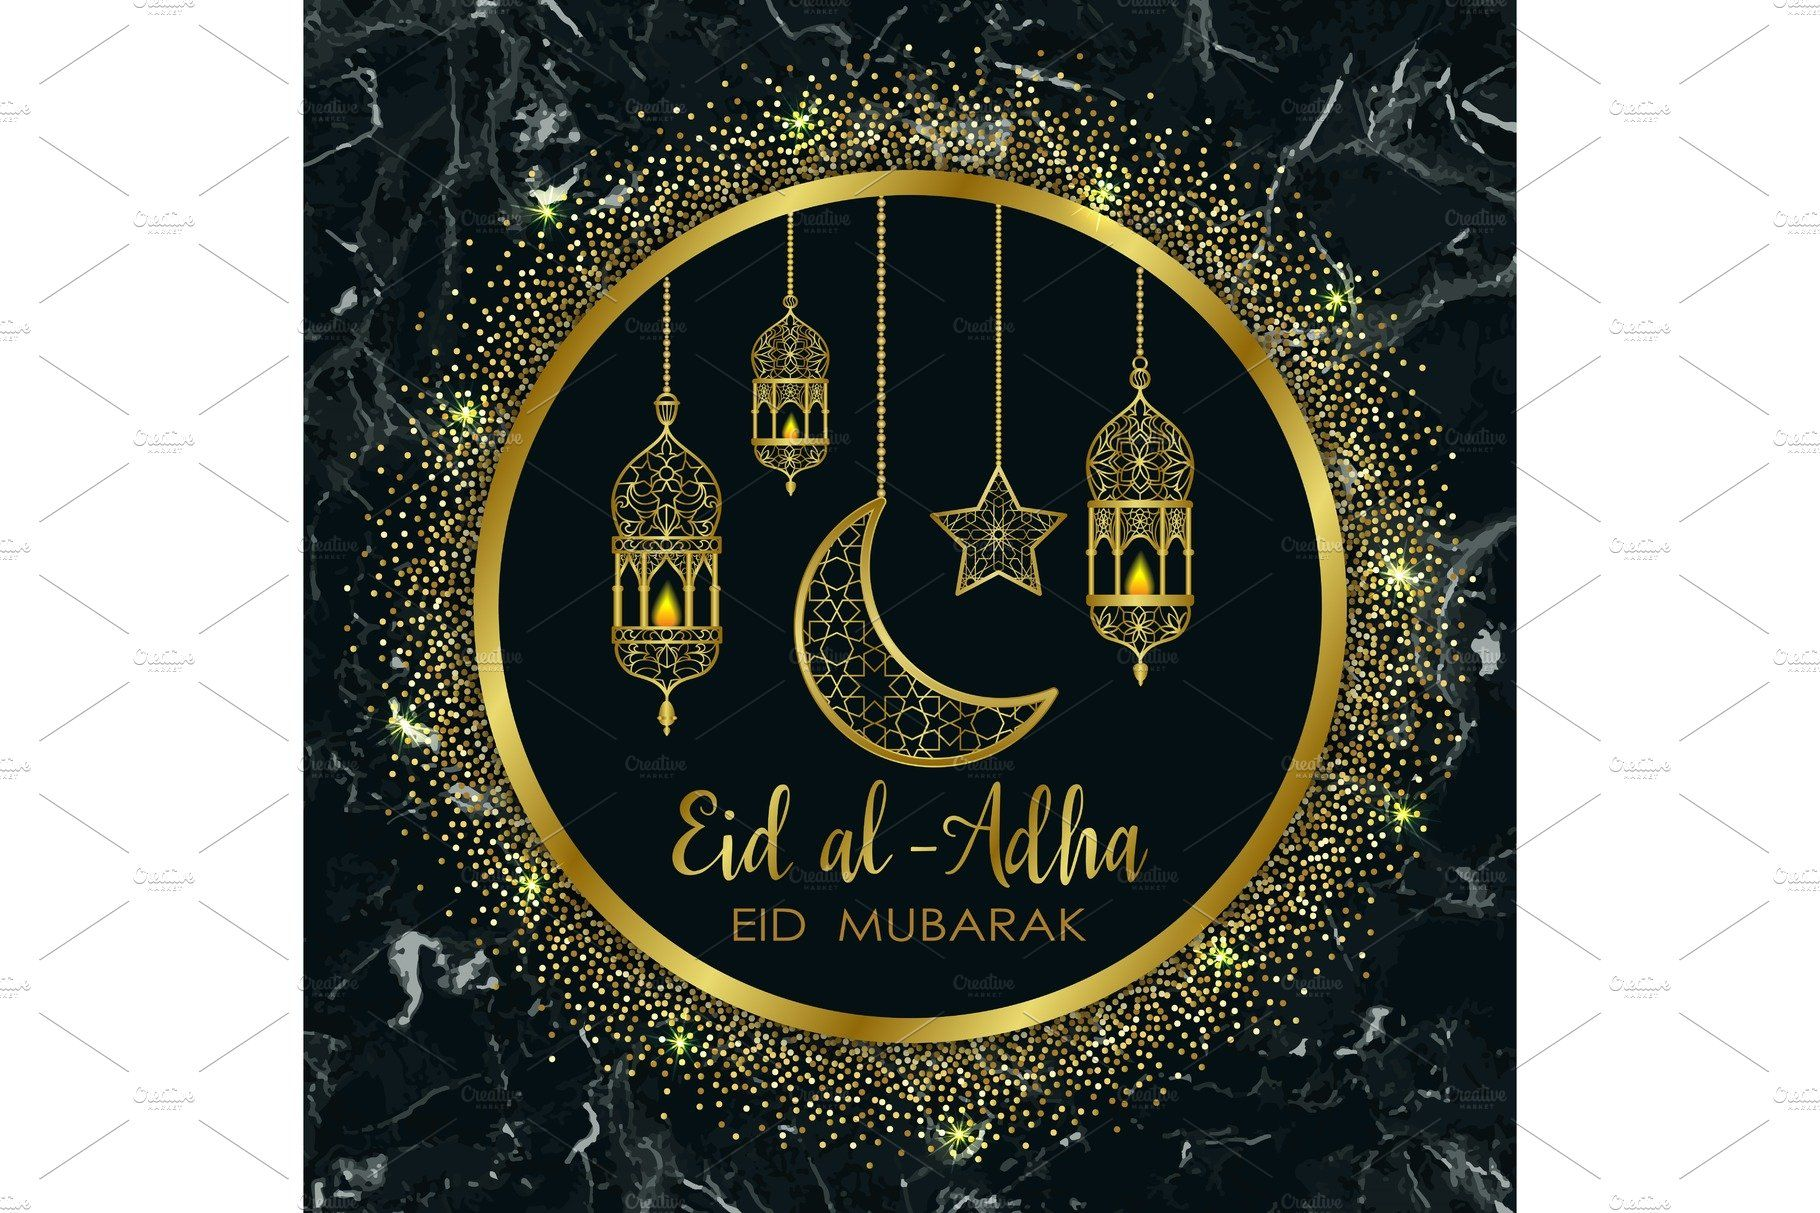 Eid Al Adha Marble Template With Images Eid Al Adha Greetings